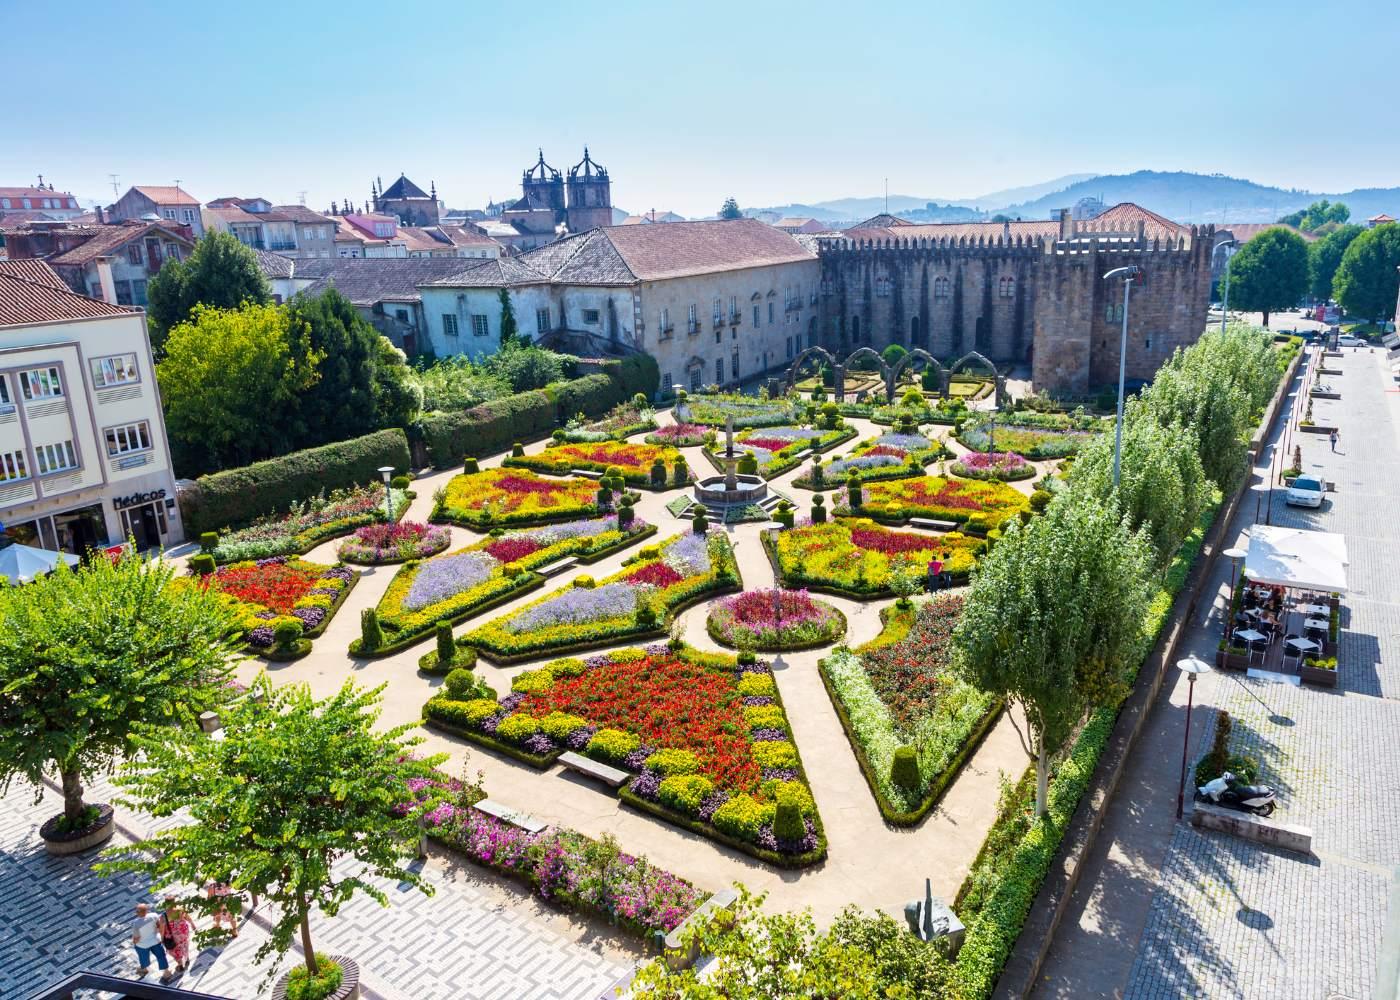 Jardim no centro de Braga